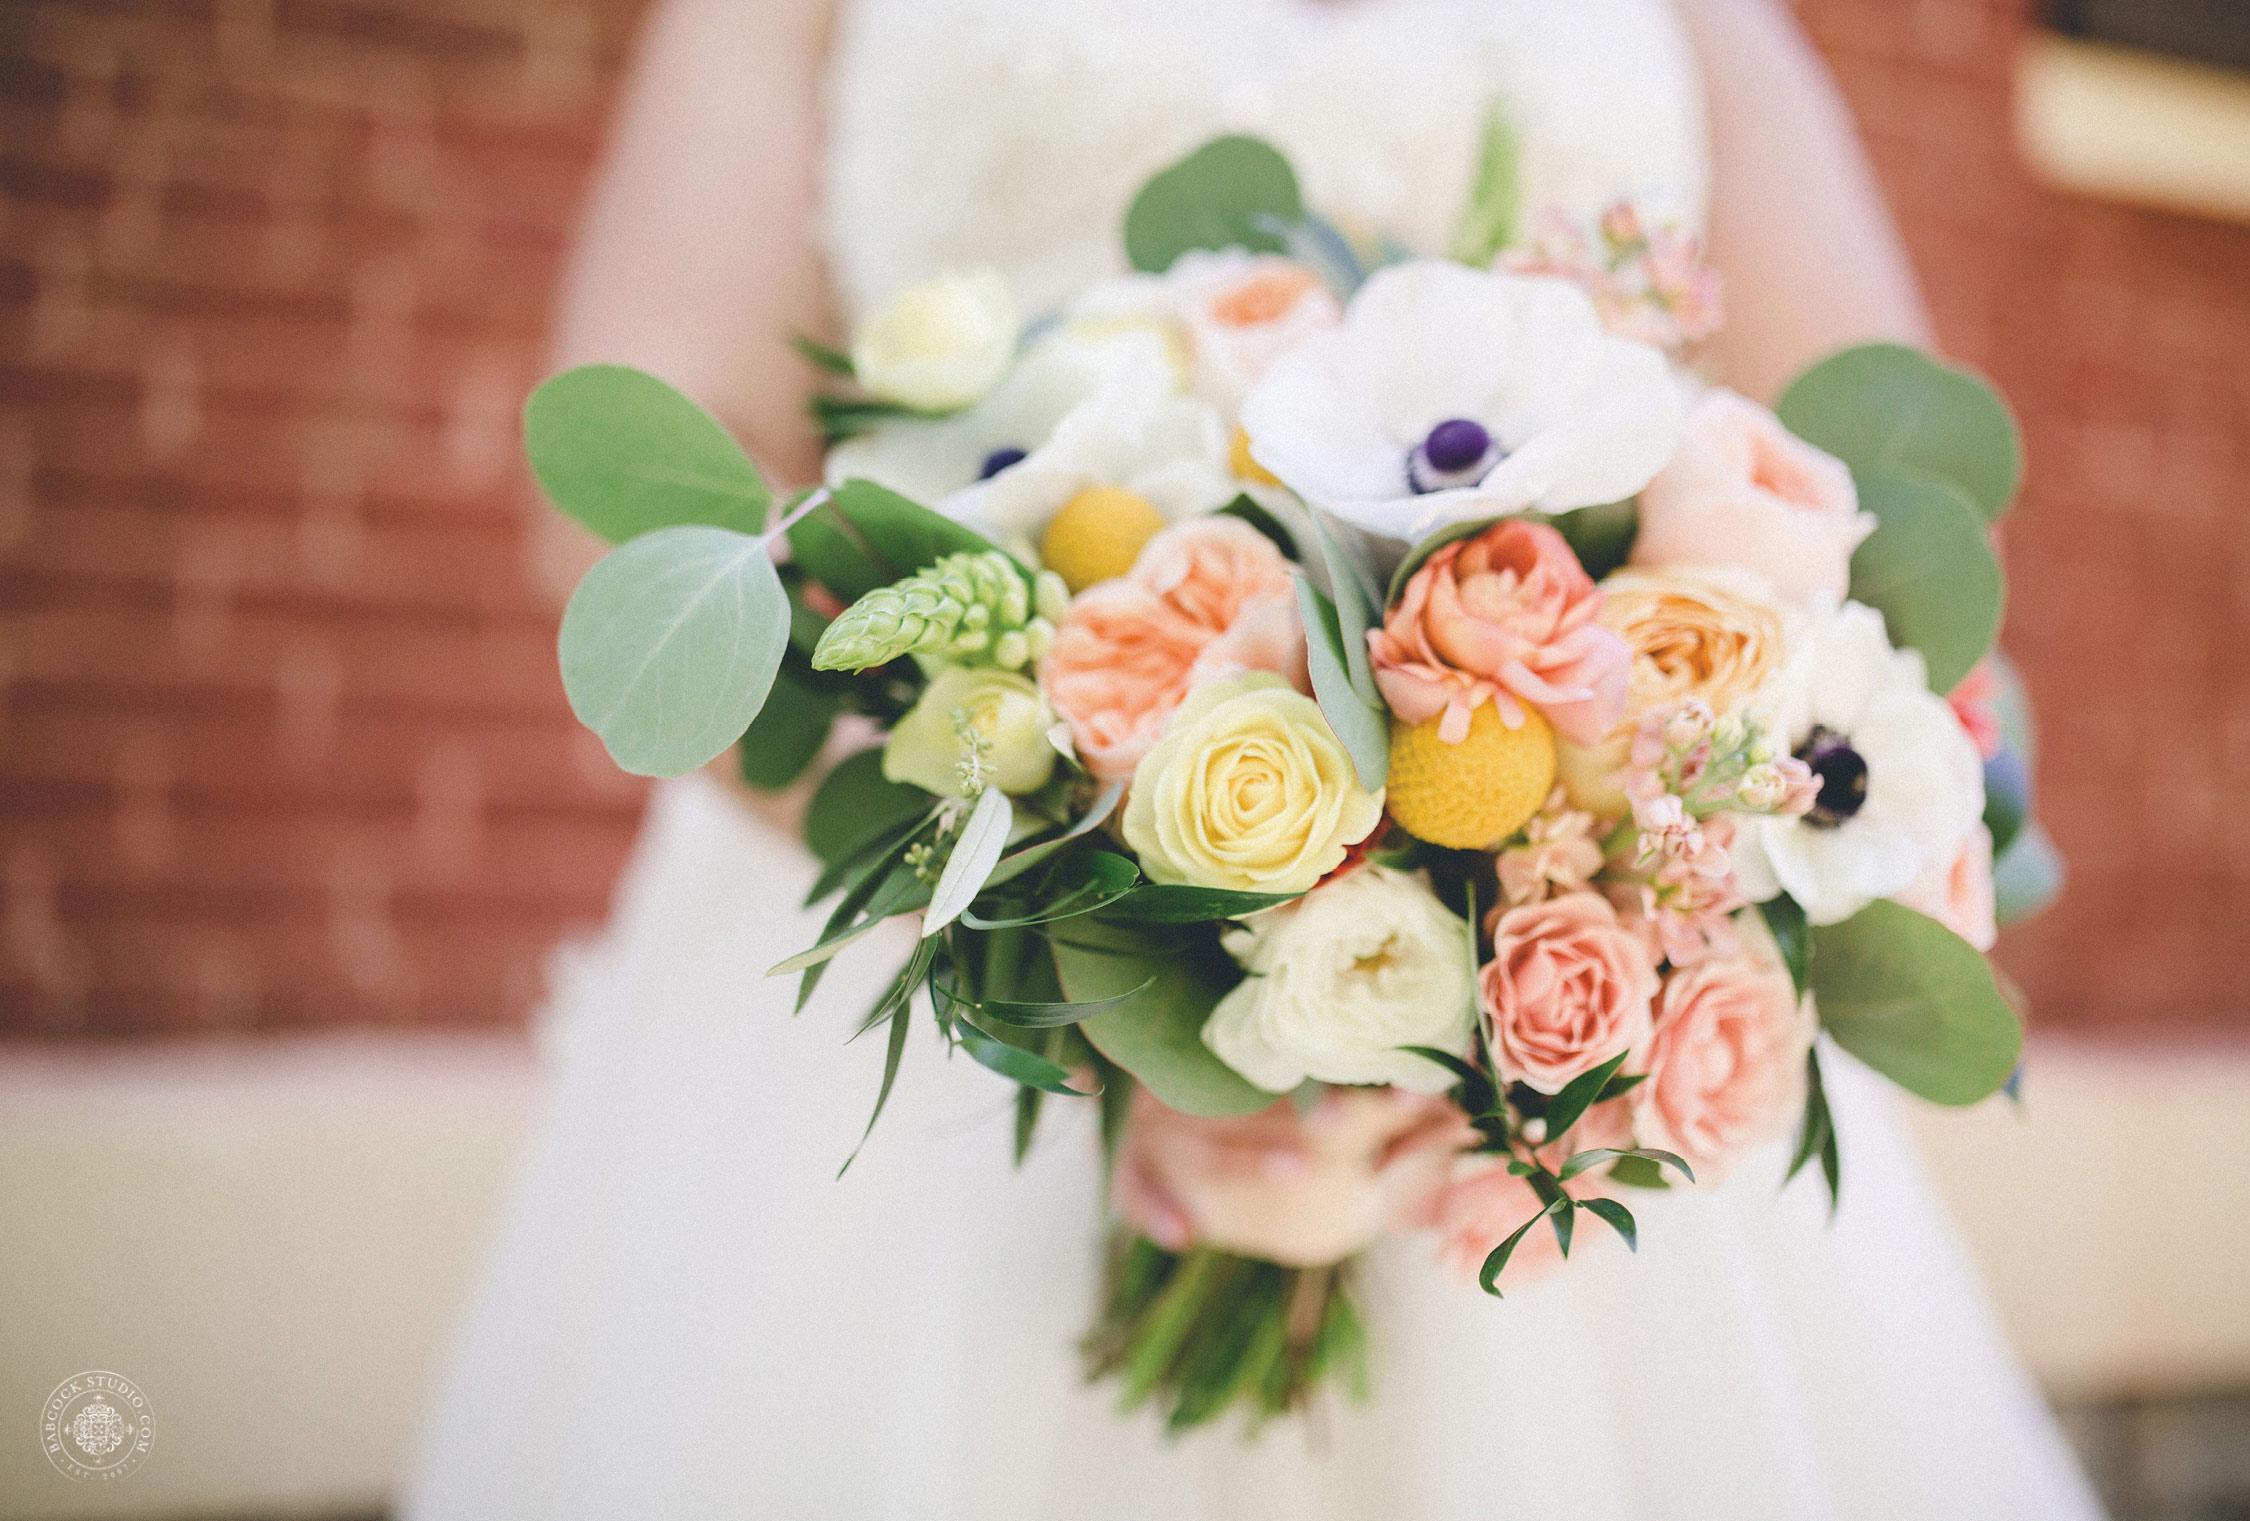 nicole-brendarn-school-house-wedding-photographer-dayton-ohio-5.jpg